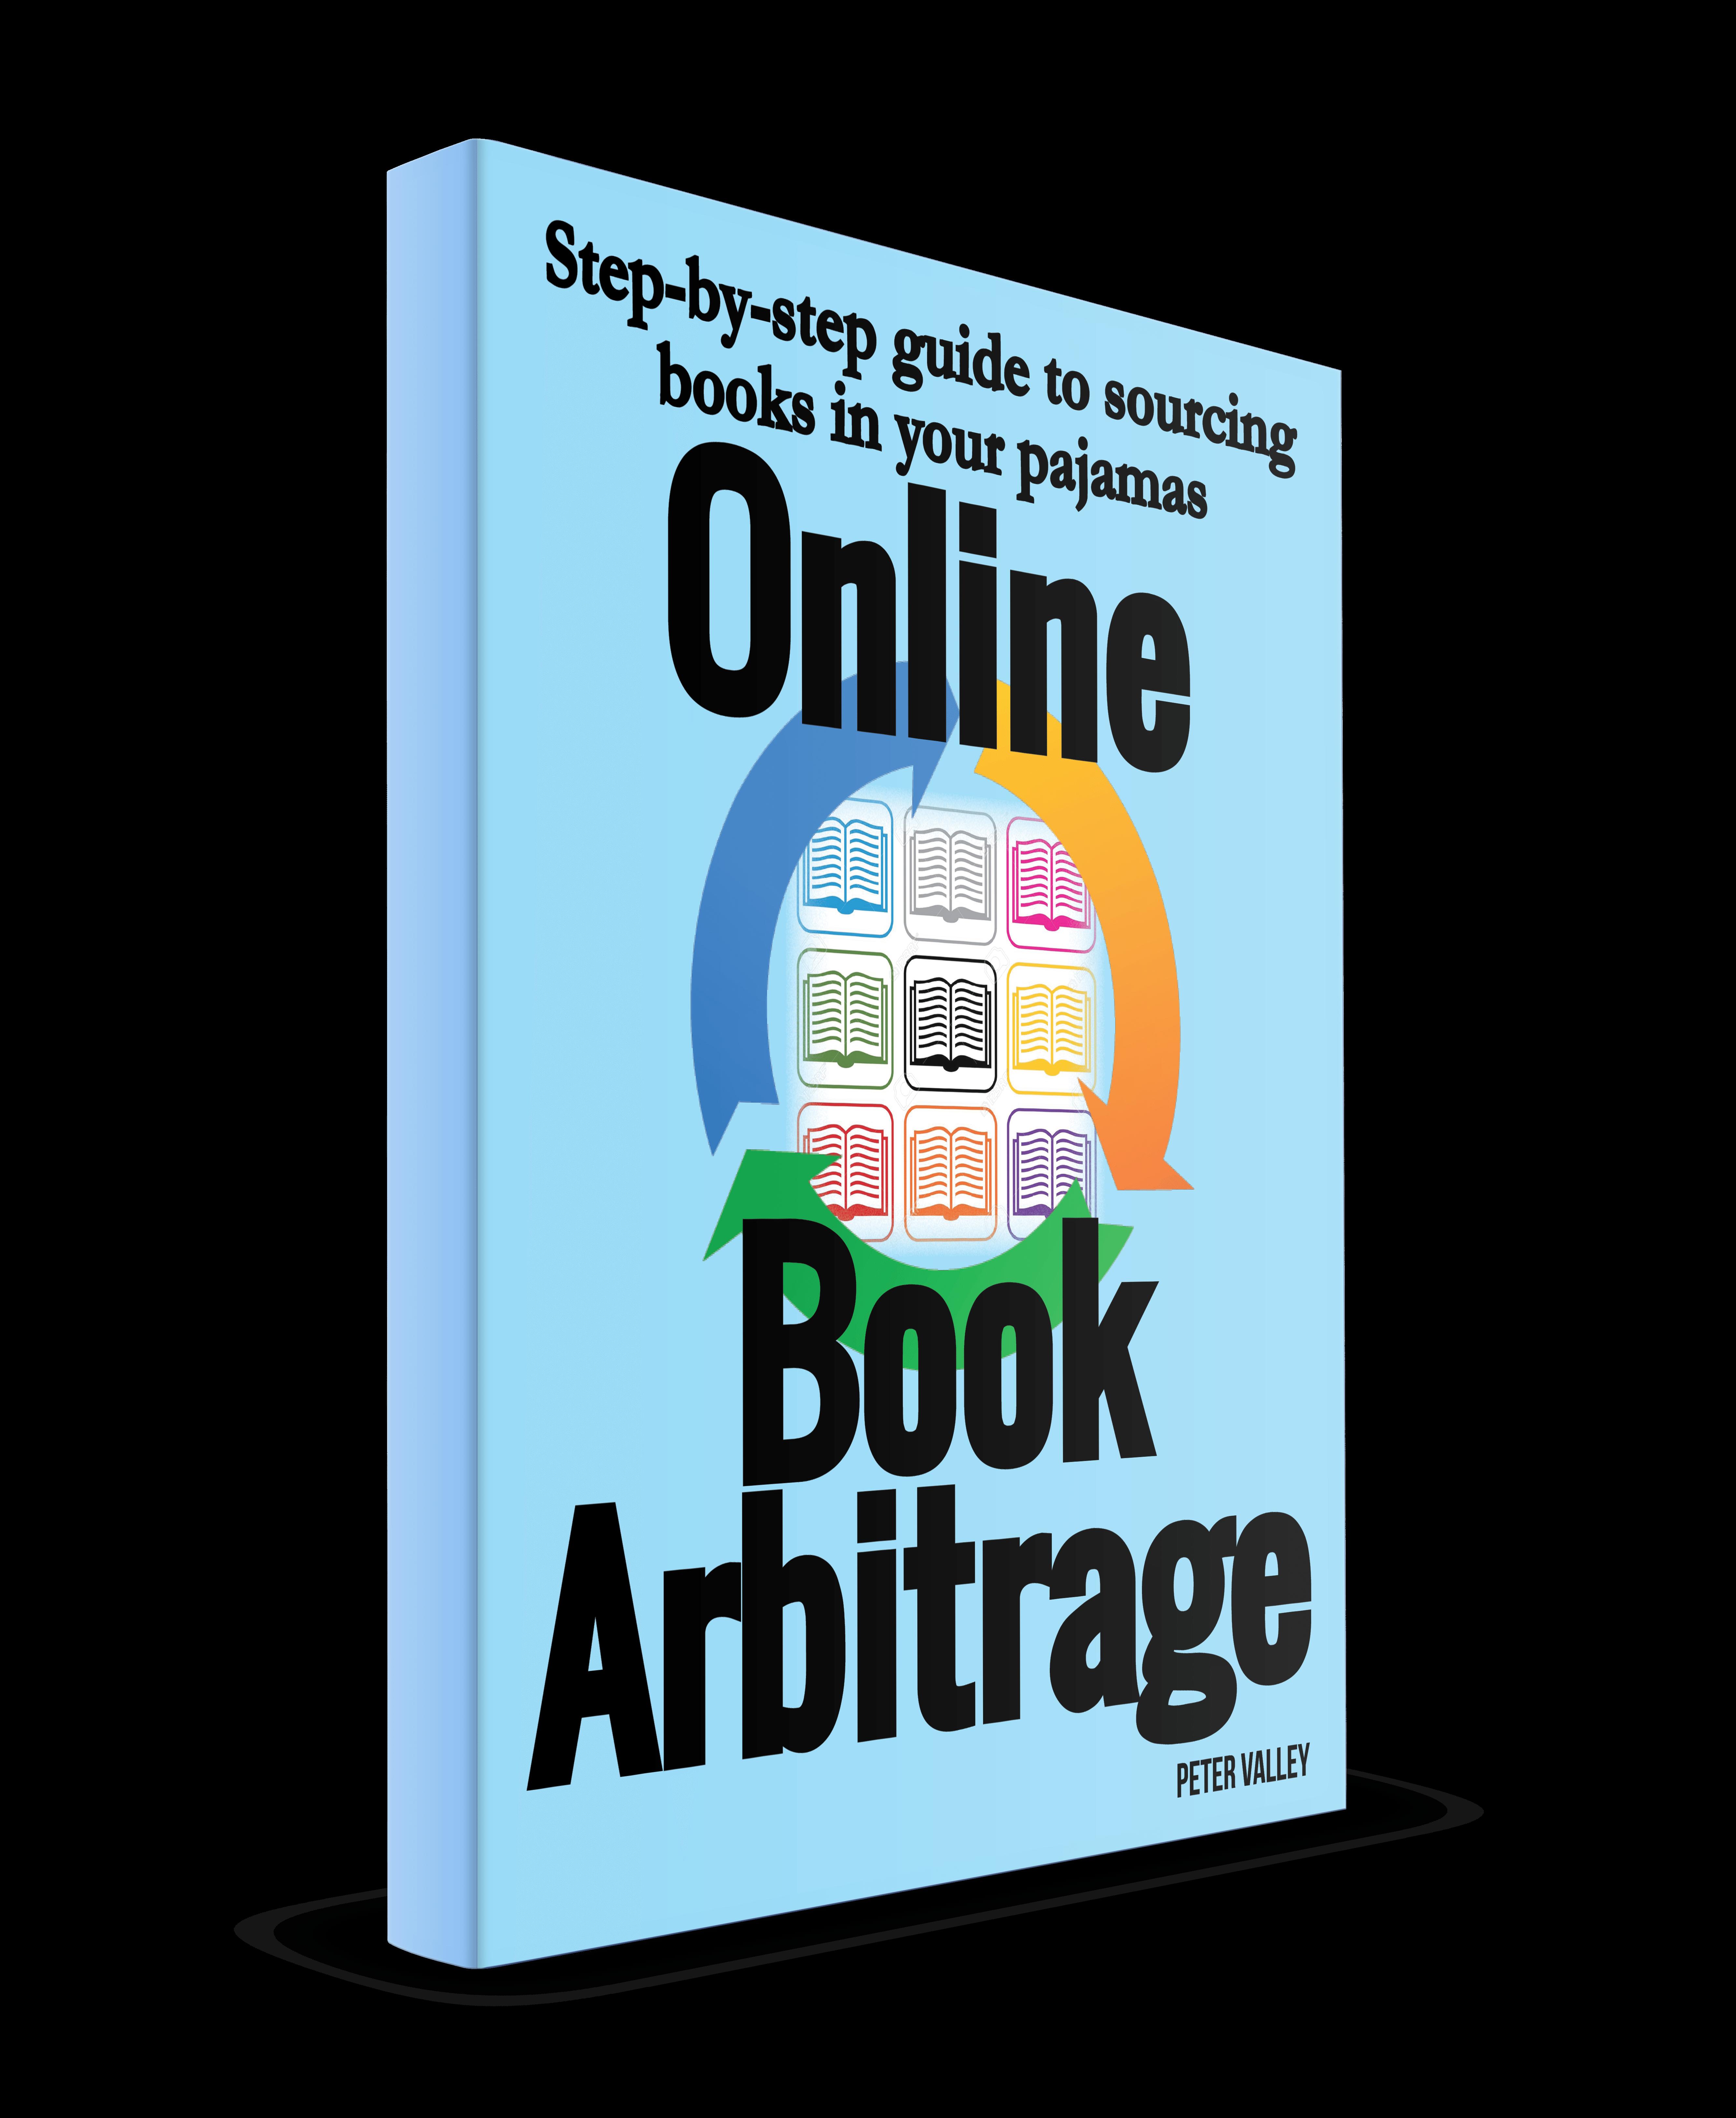 Online Book Arbitrage Free Book